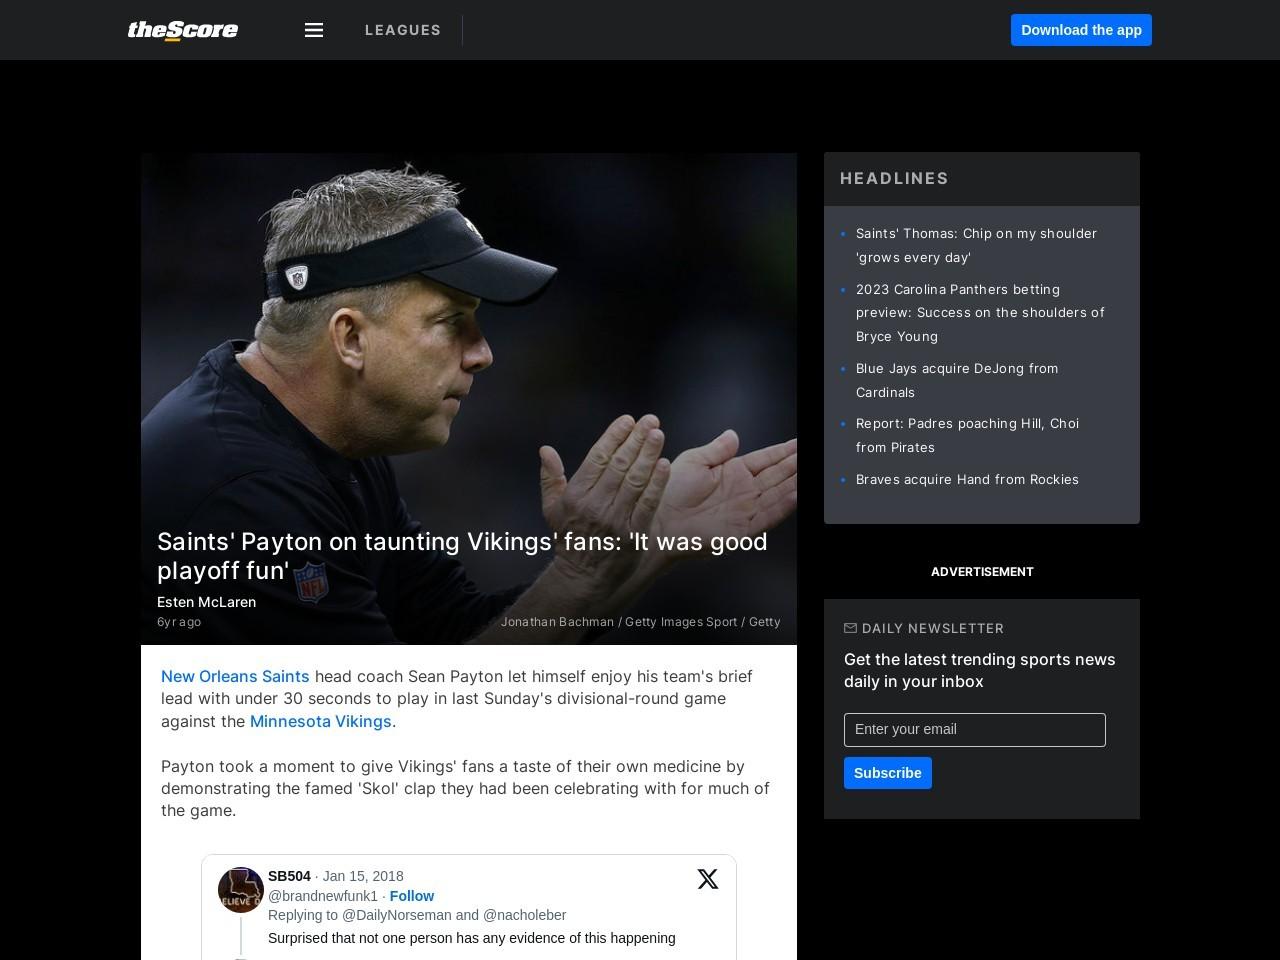 Saints' Payton on taunting Vikings' fans: 'It was good playoff fun'